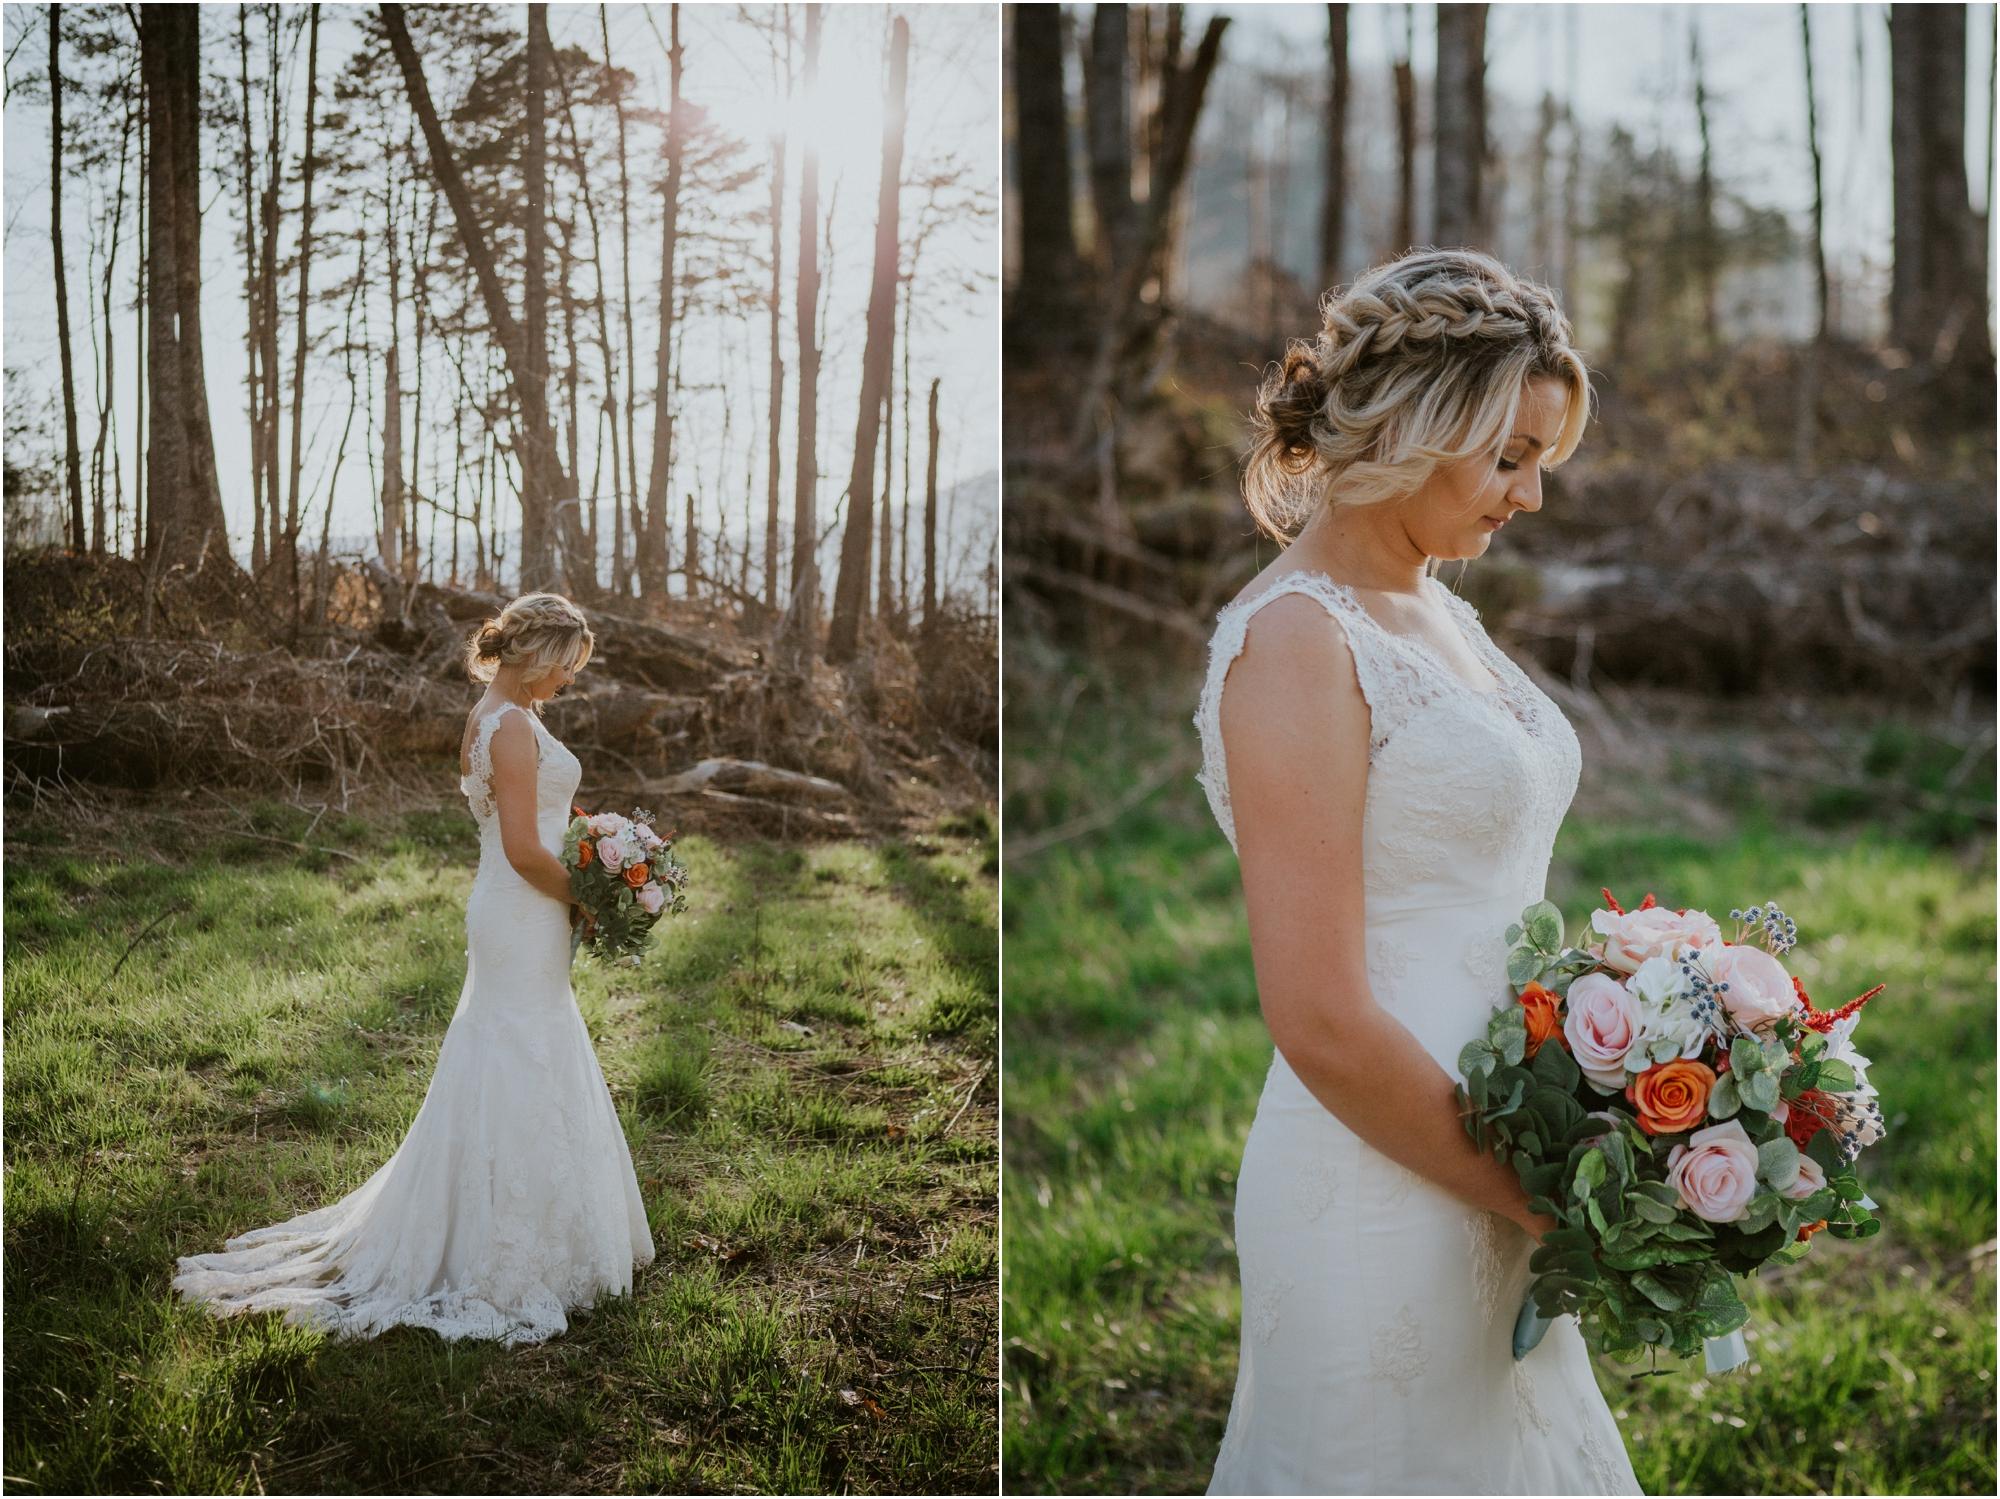 watauga-lake--bohemian-bridal-styled-session-northeast-tennessee-wedding-elopement-photography_0001.jpg